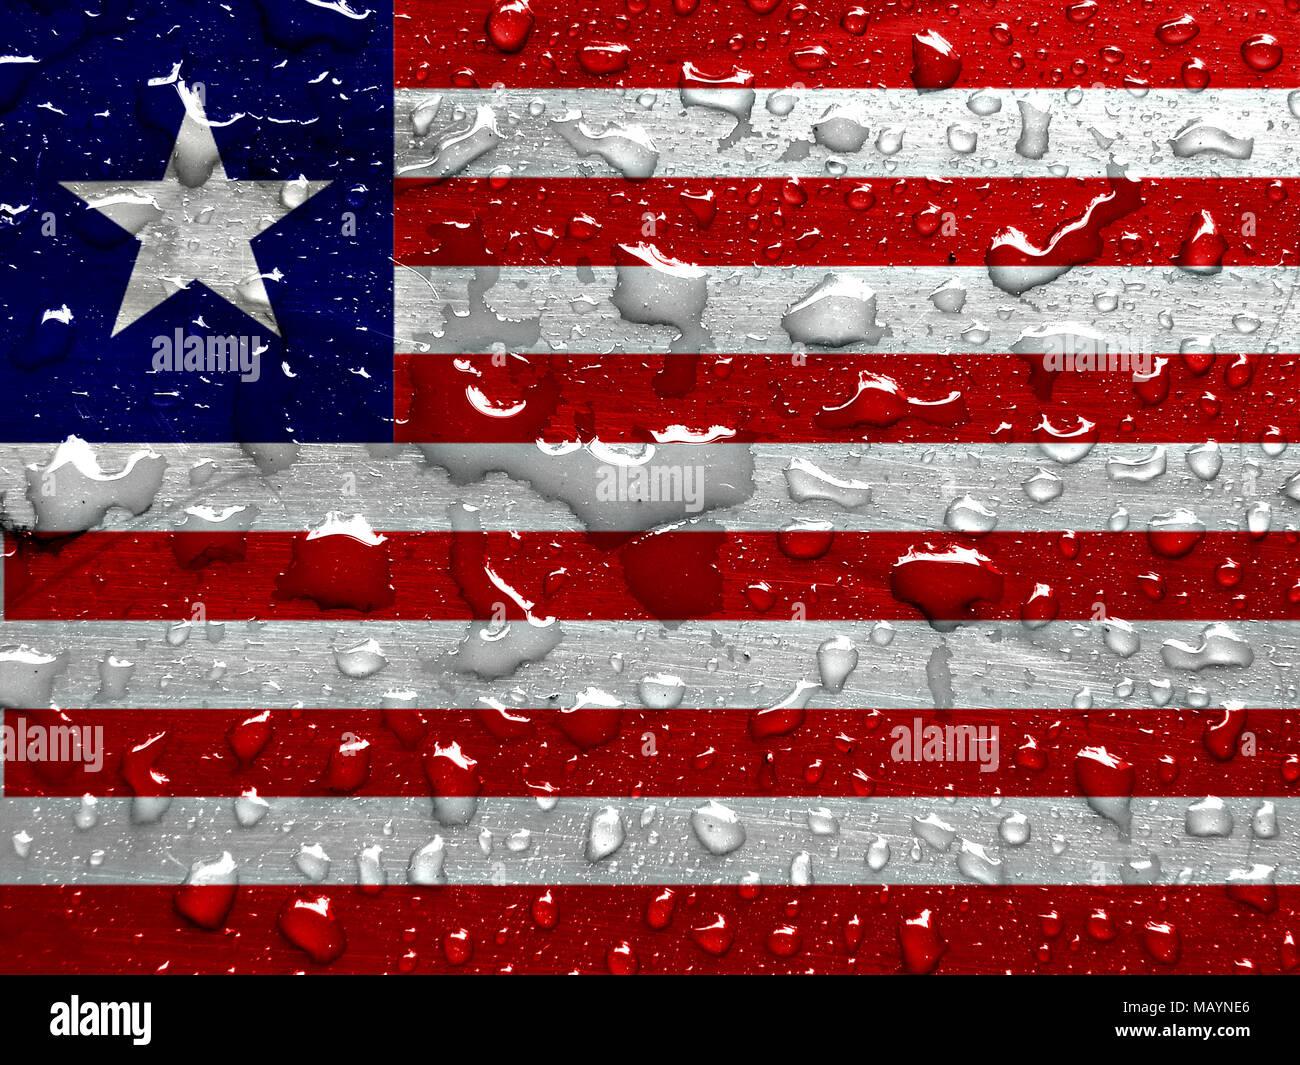 flag of Liberia with rain drops - Stock Image